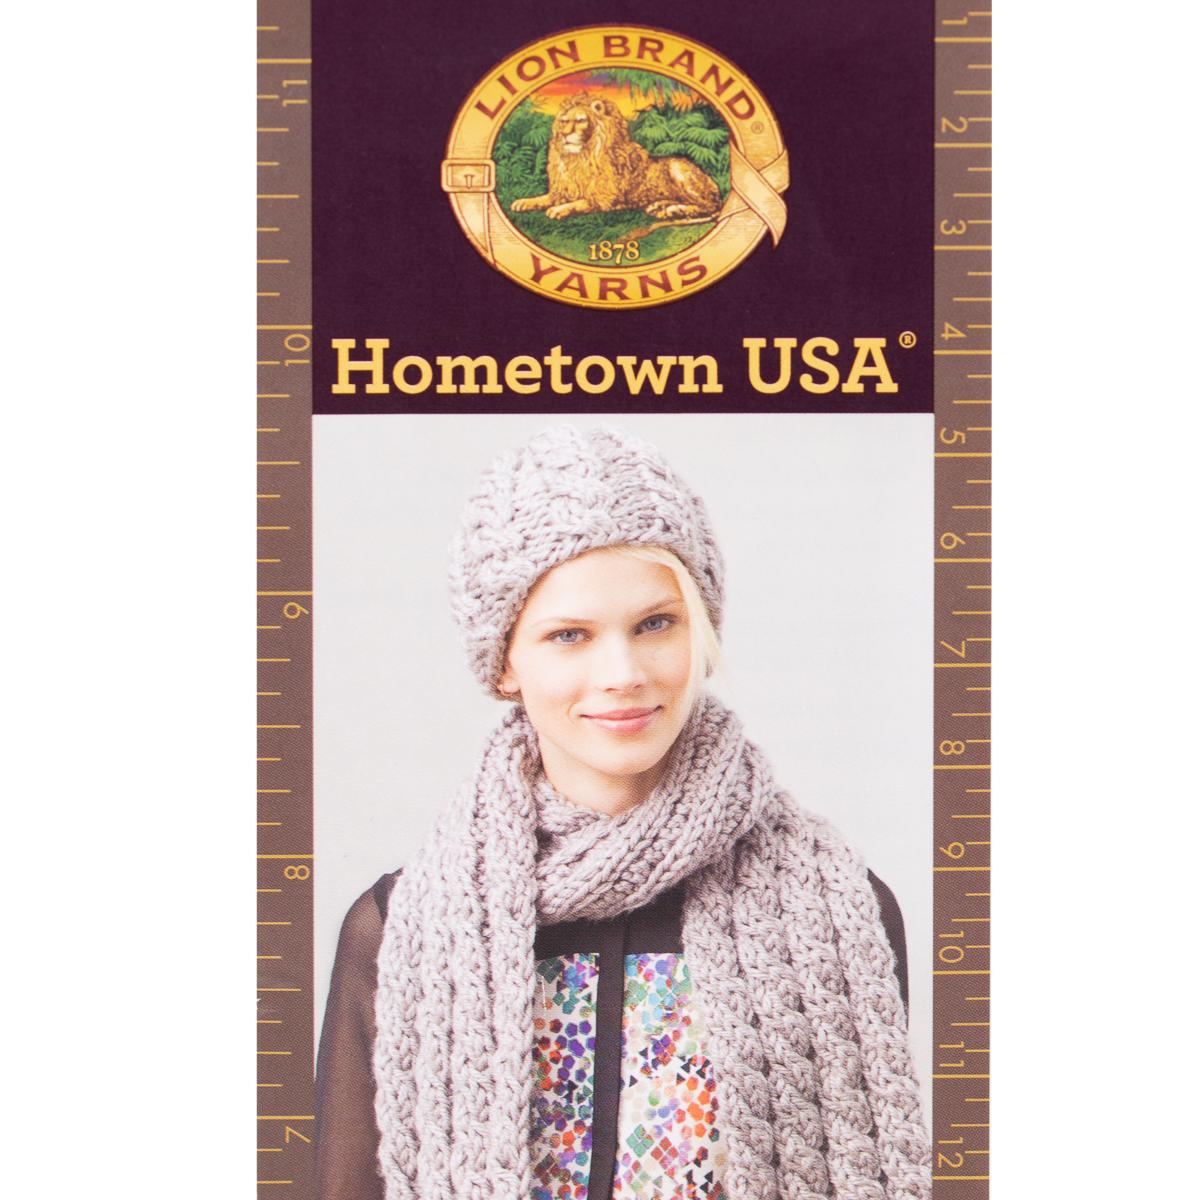 3pk-Lion-Brand-Hometown-USA-100-Acrylic-Yarn-Super-Bulky-6-Knit-Crochet-Skeins thumbnail 11